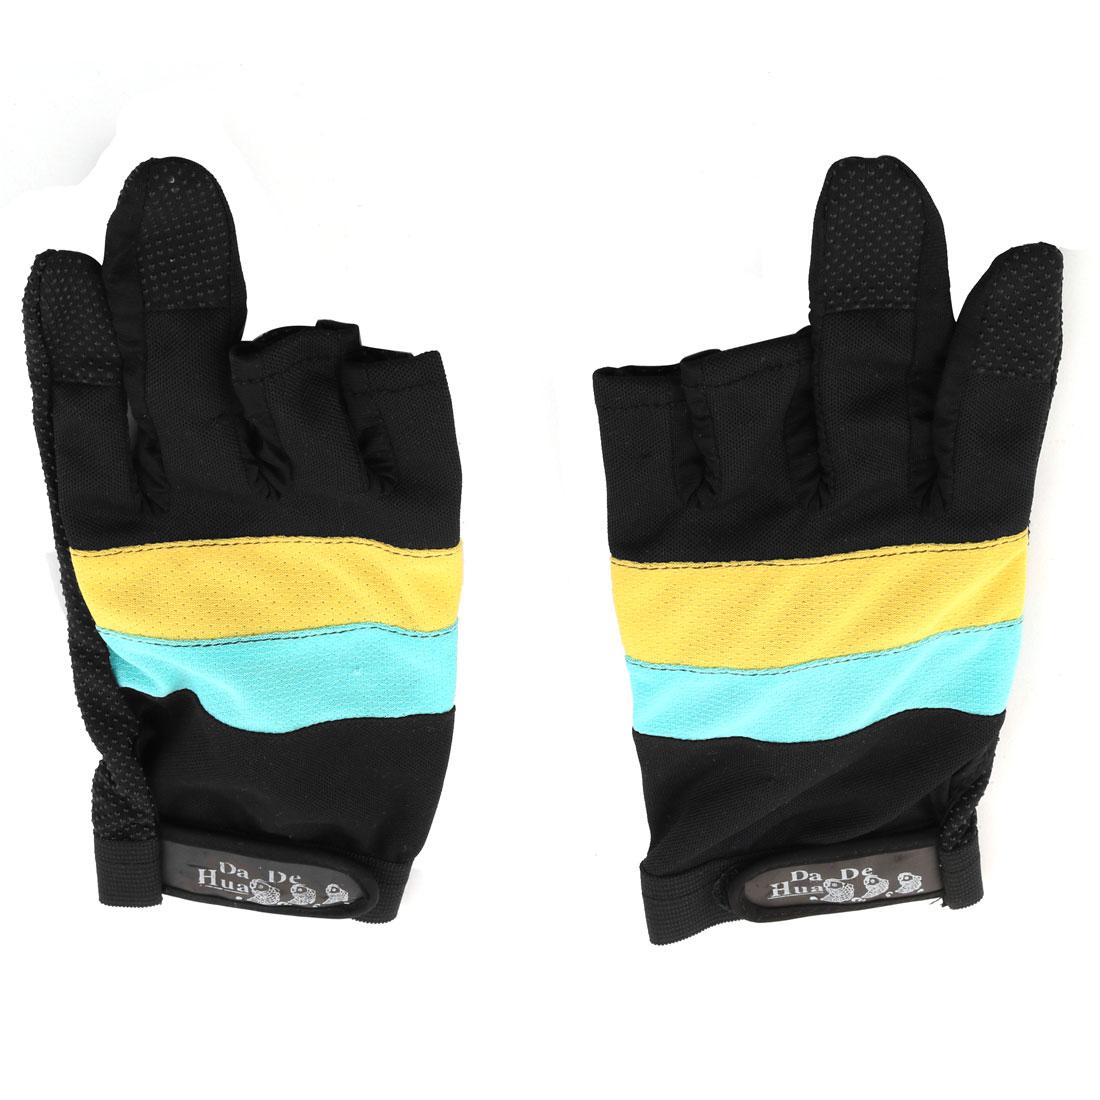 Fishing Rubber 3 Fingers Cut Elastic Wrist Band Nonslip Palm Gloves Black Pair